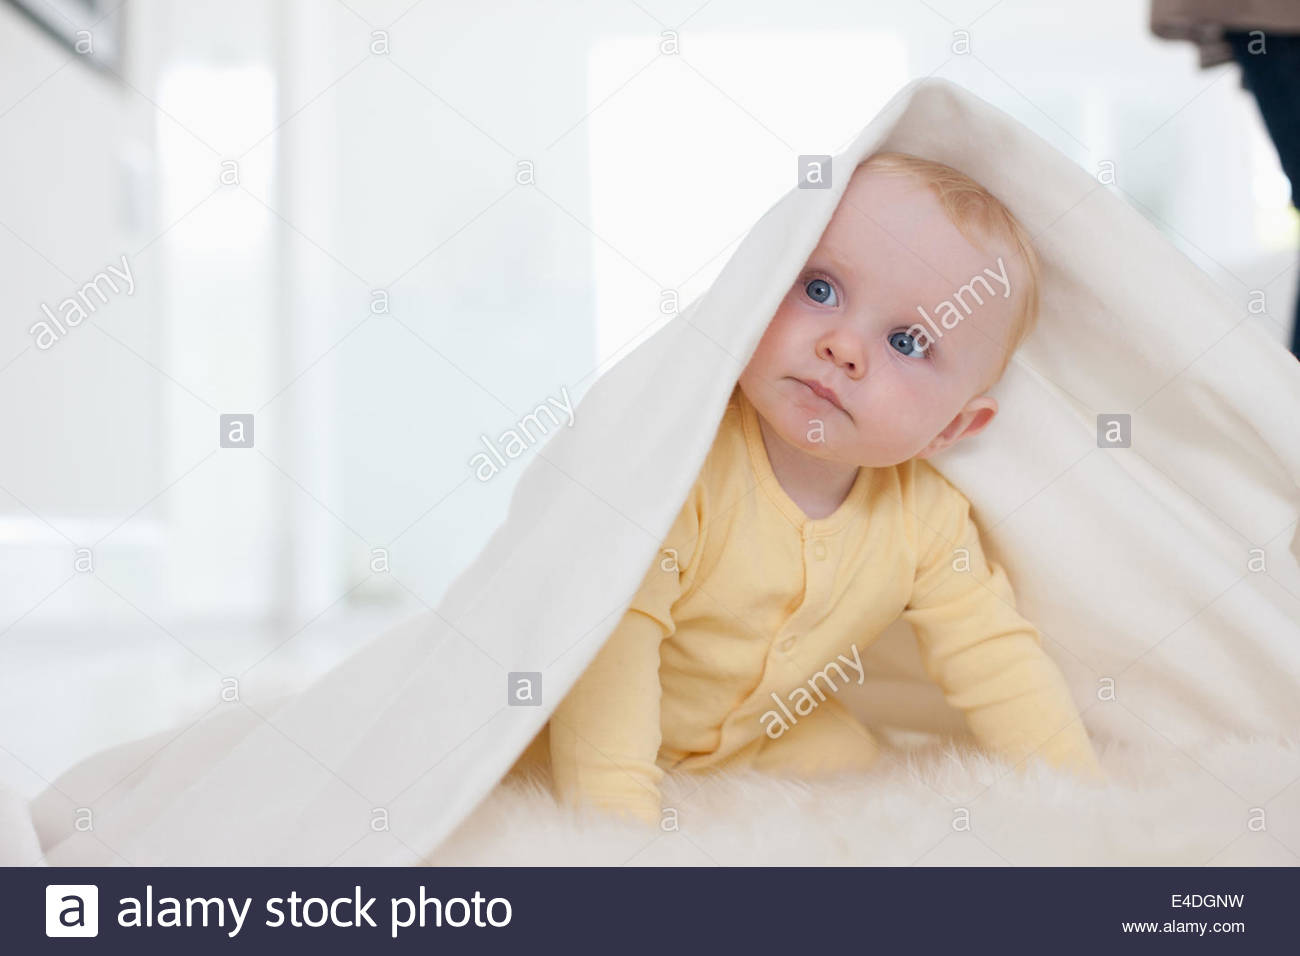 Baby playing with blanket on rug - Stock Image